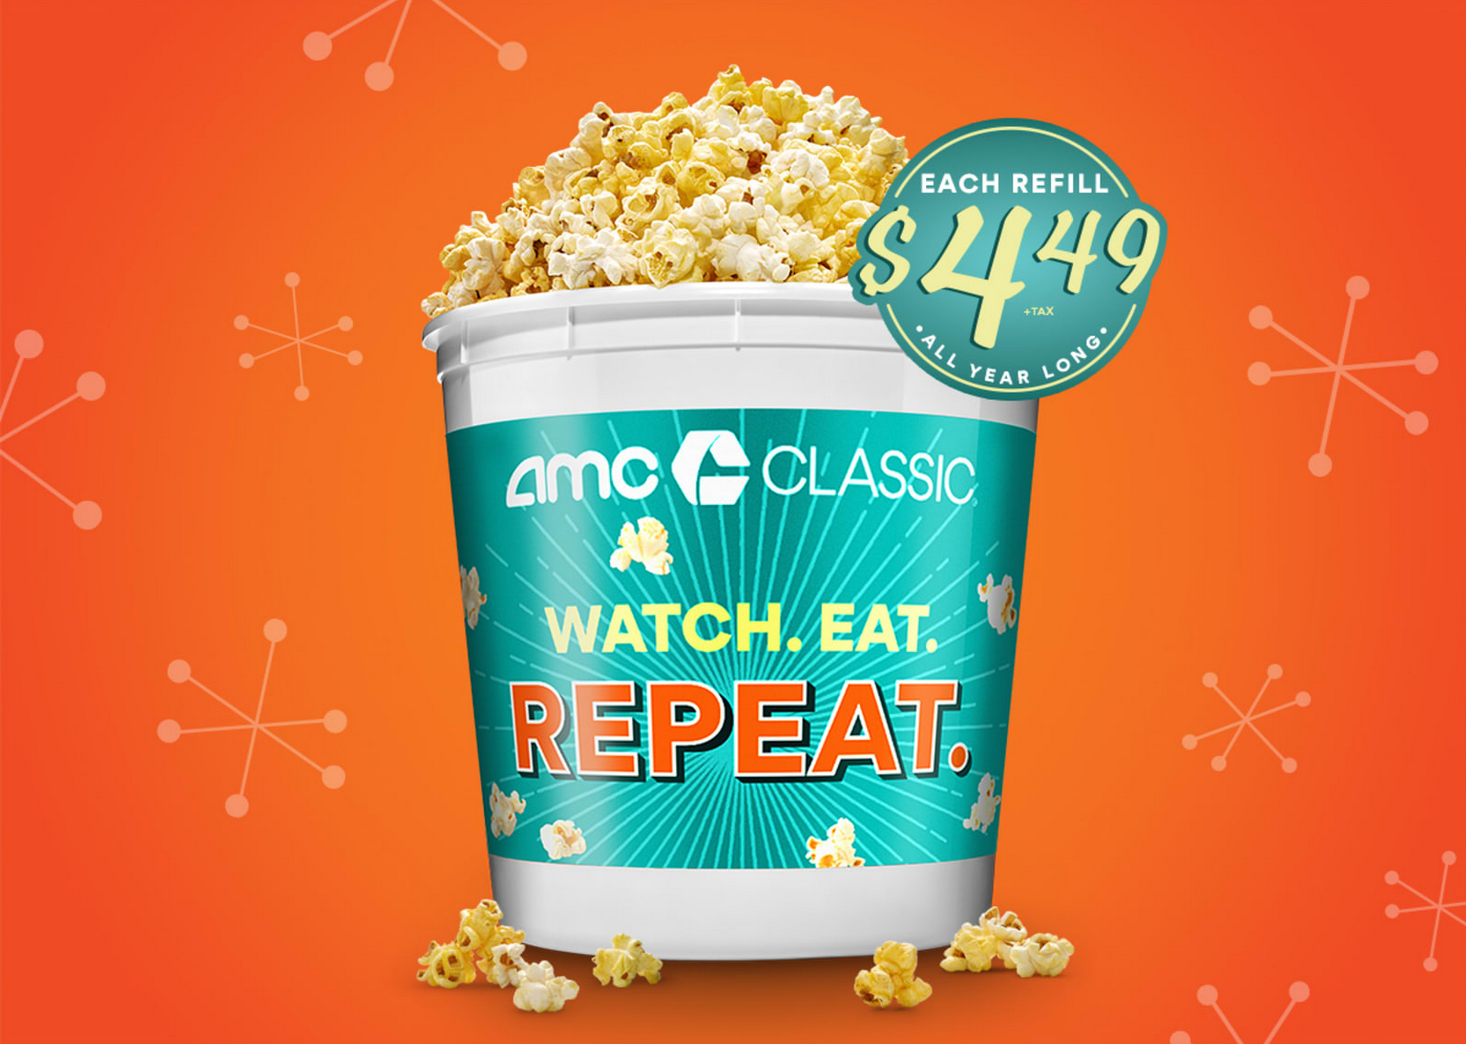 The 2019 Annual Popcorn Bucket